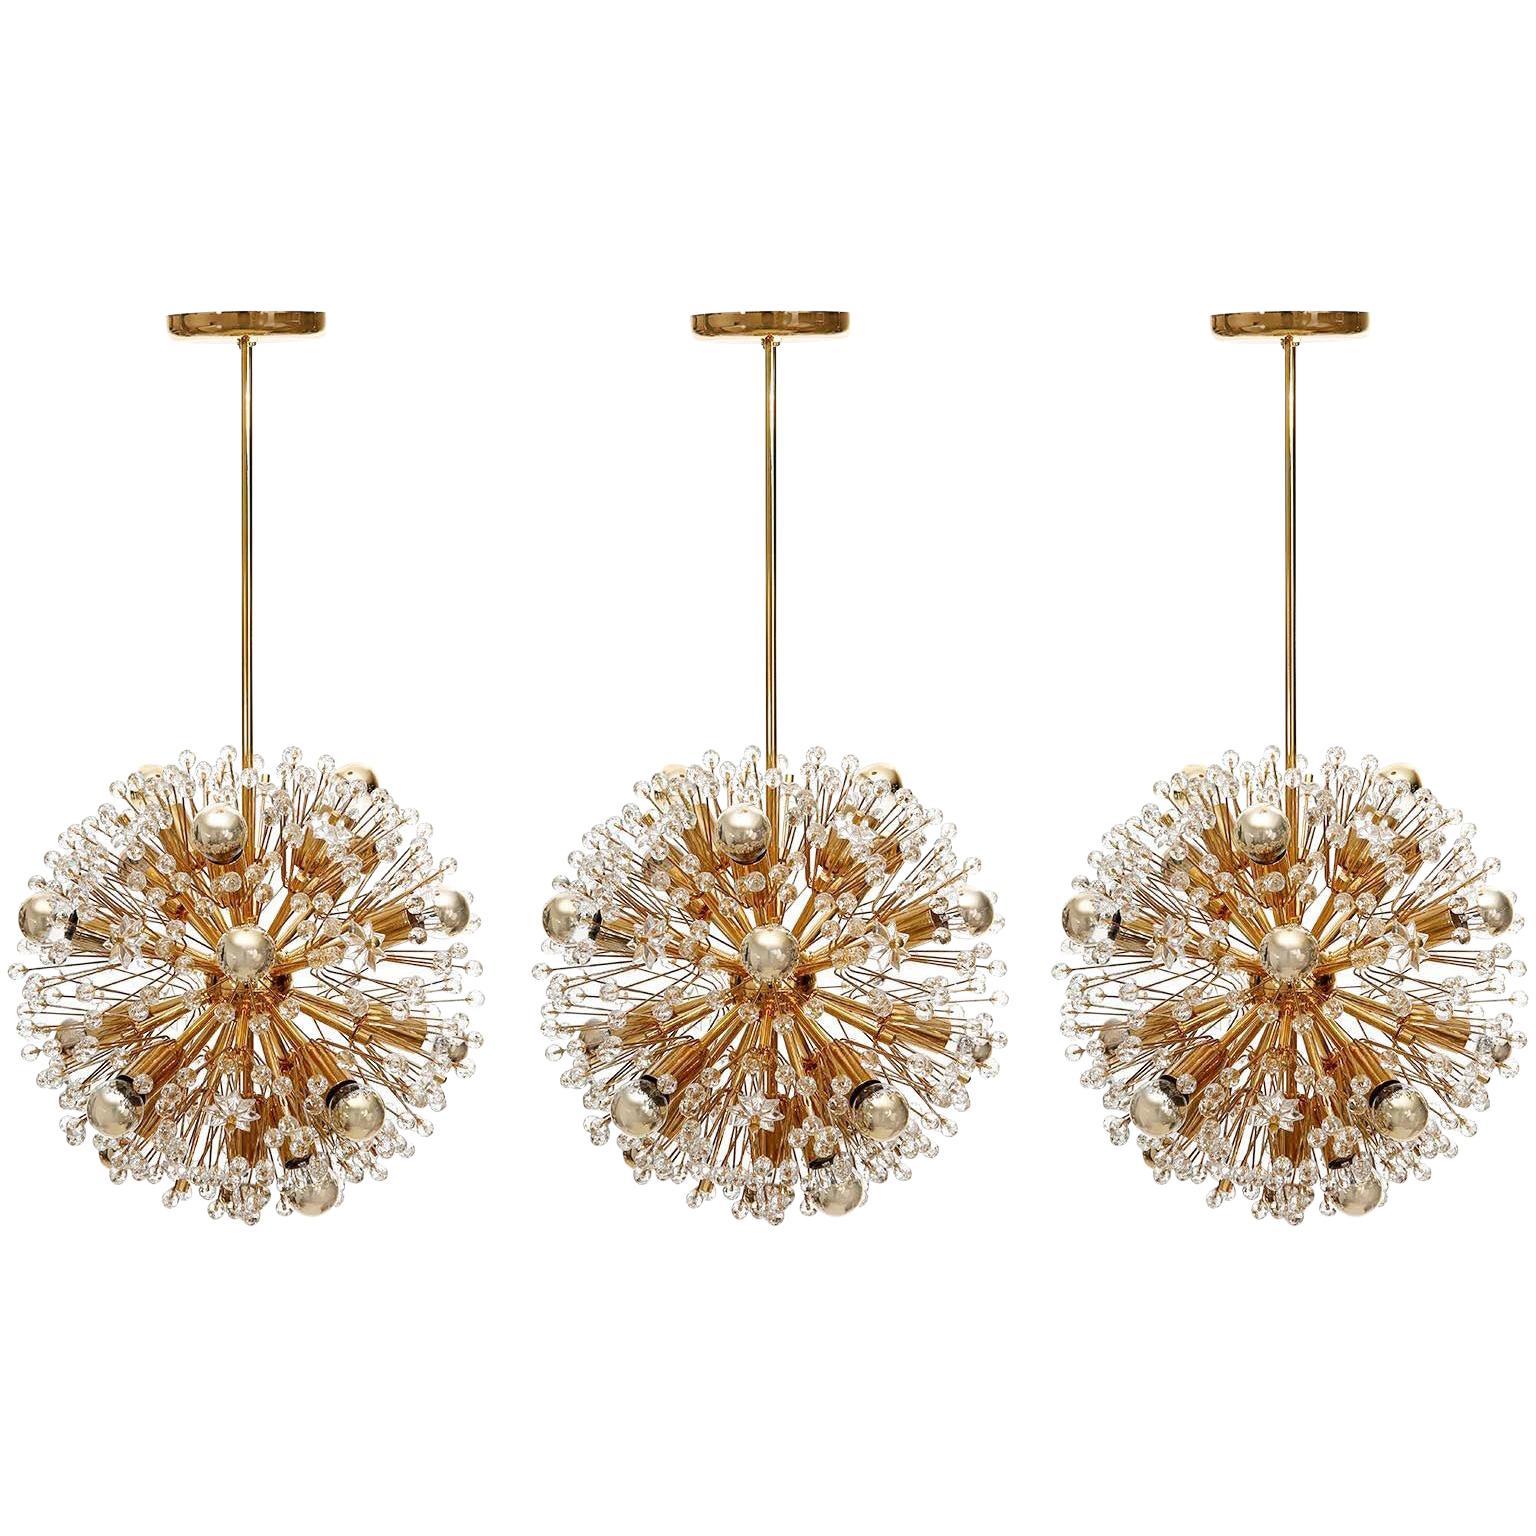 Three Emil Stejnar Sputnik Chandeliers Pendant Lights, Gilt Brass Glass, 1970